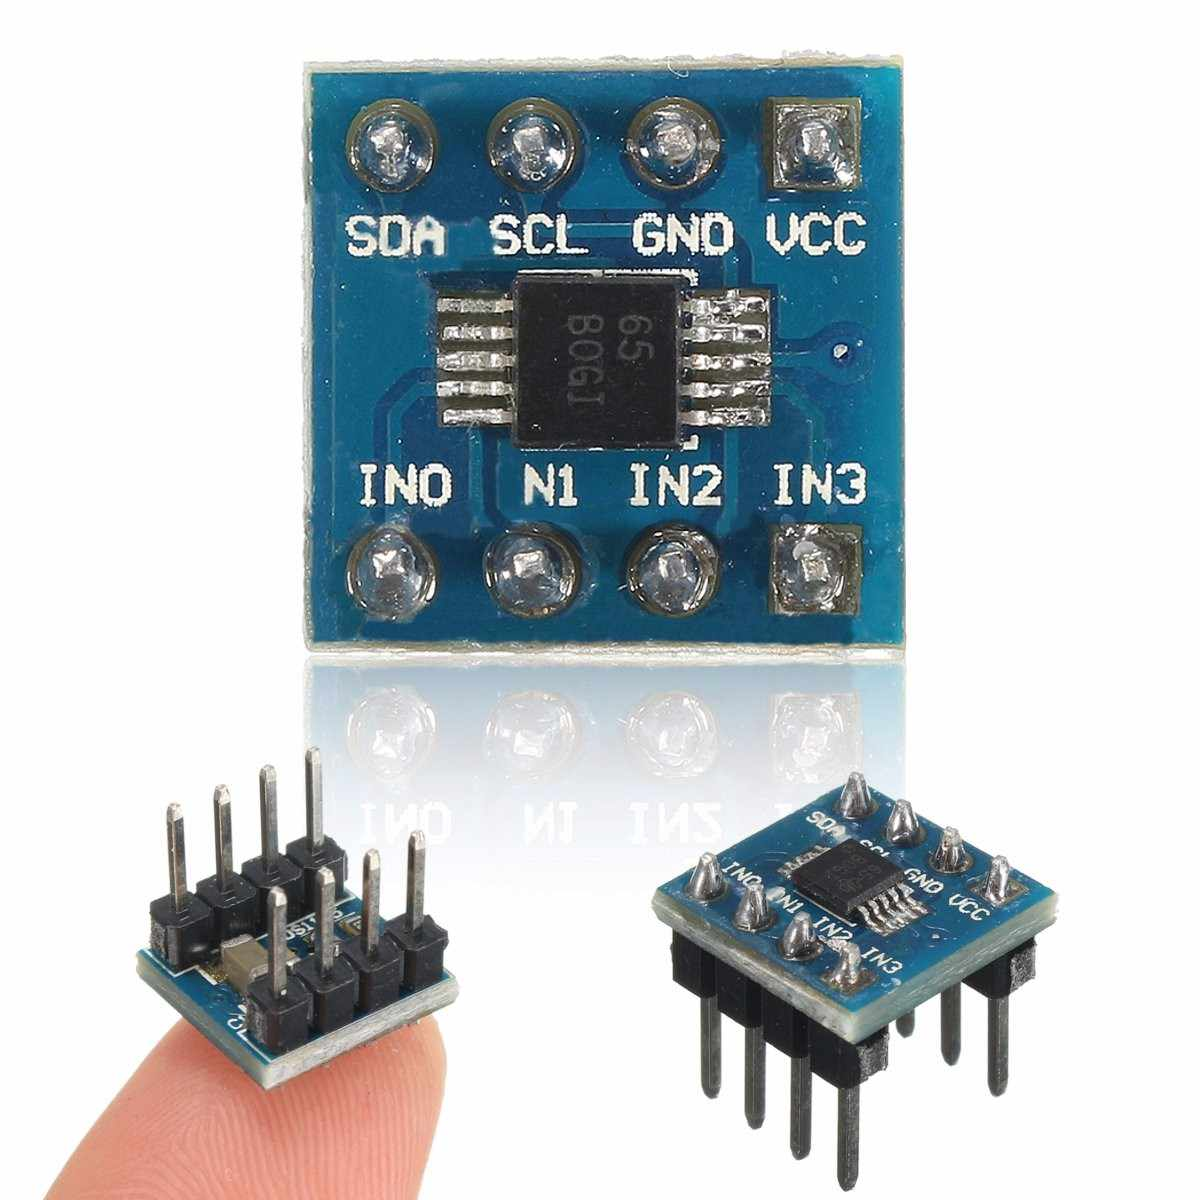 CLAITE 1 PC Mini 4 ช่อง ADS1115 โมดูล 16 บิต I2C ADC โมดูล Pro Gain Amplifier